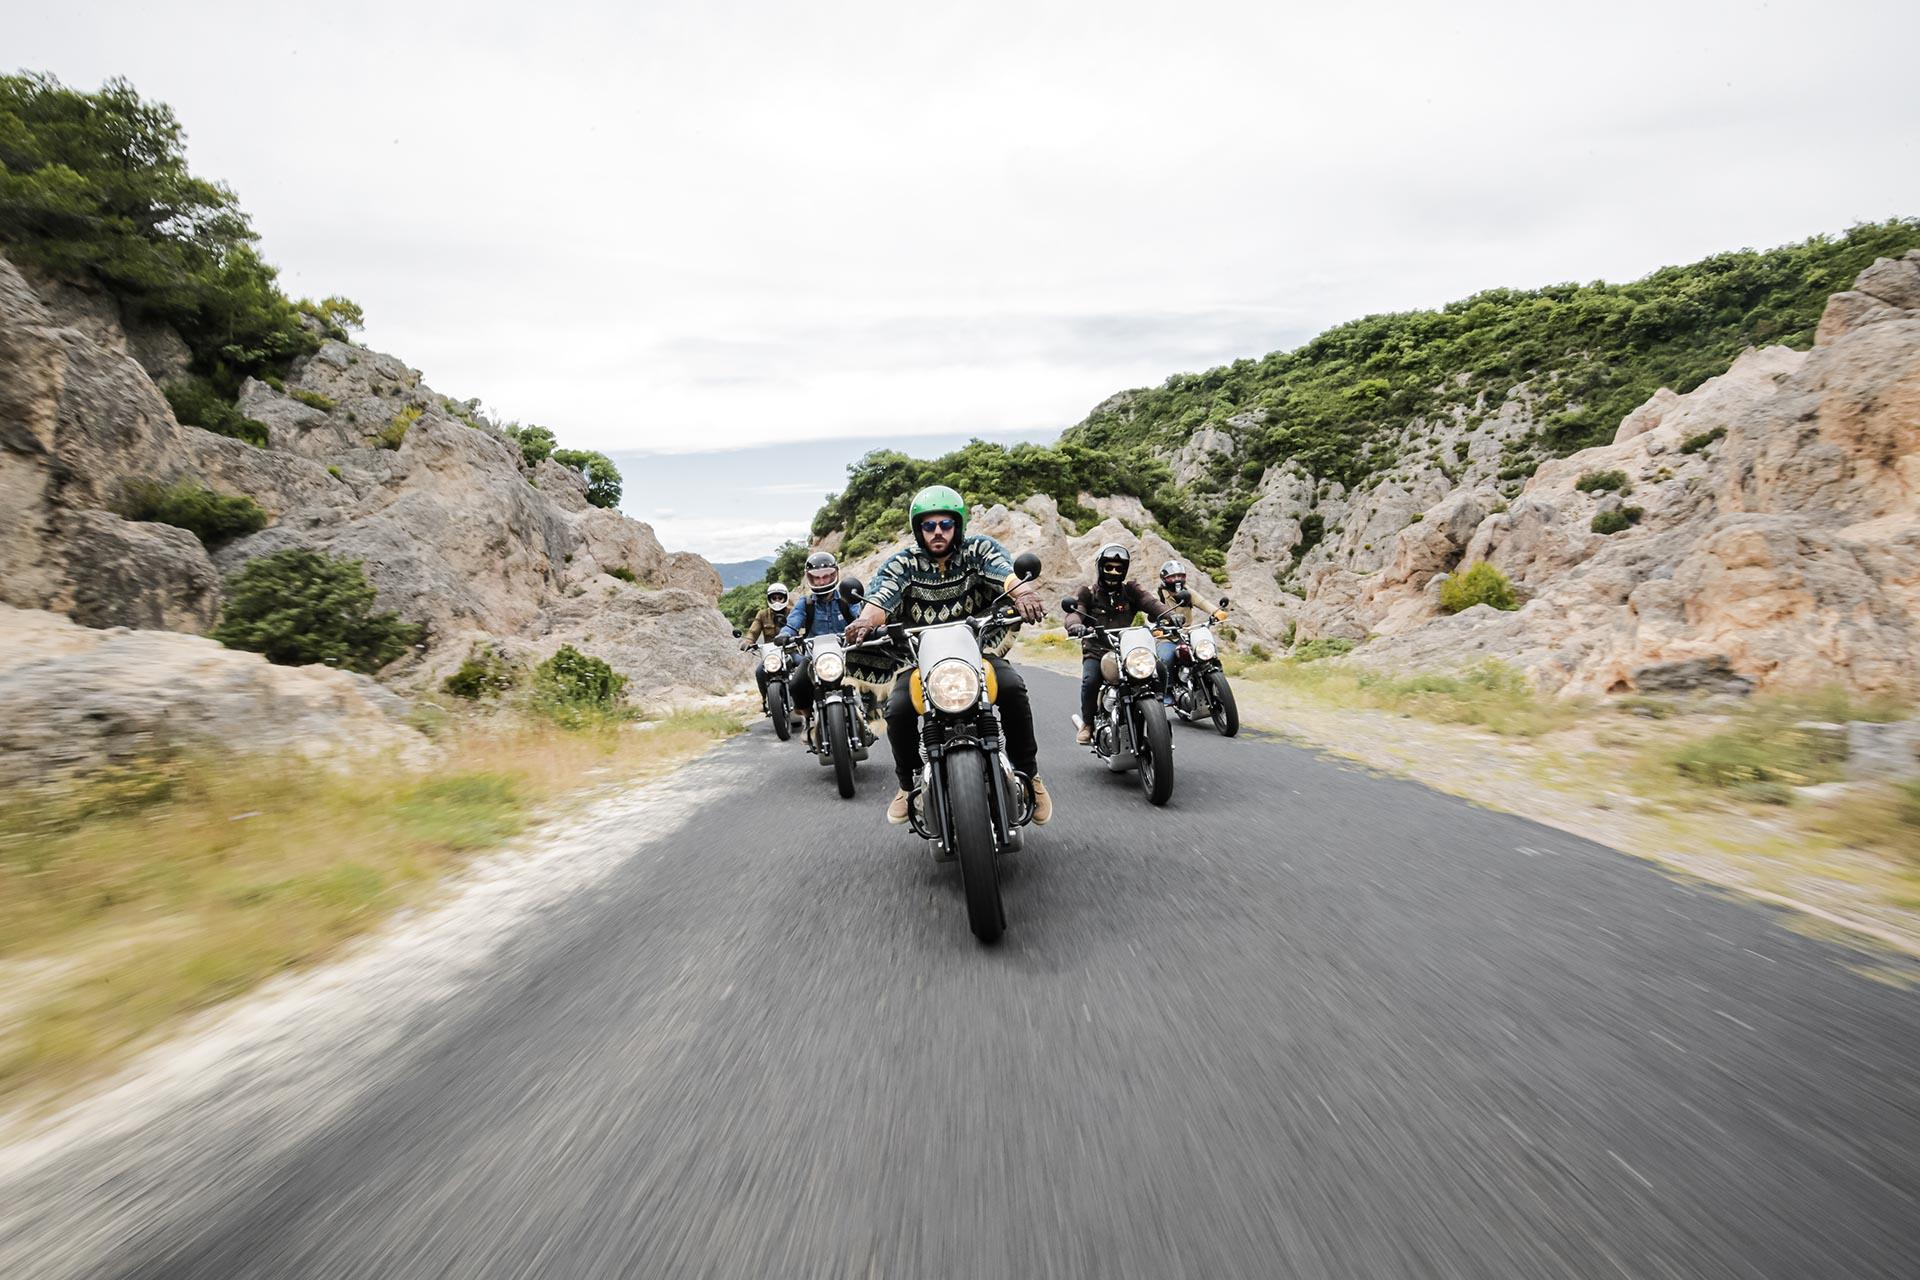 Roadtrips moto en Royal Enfield. Rouler entre amis